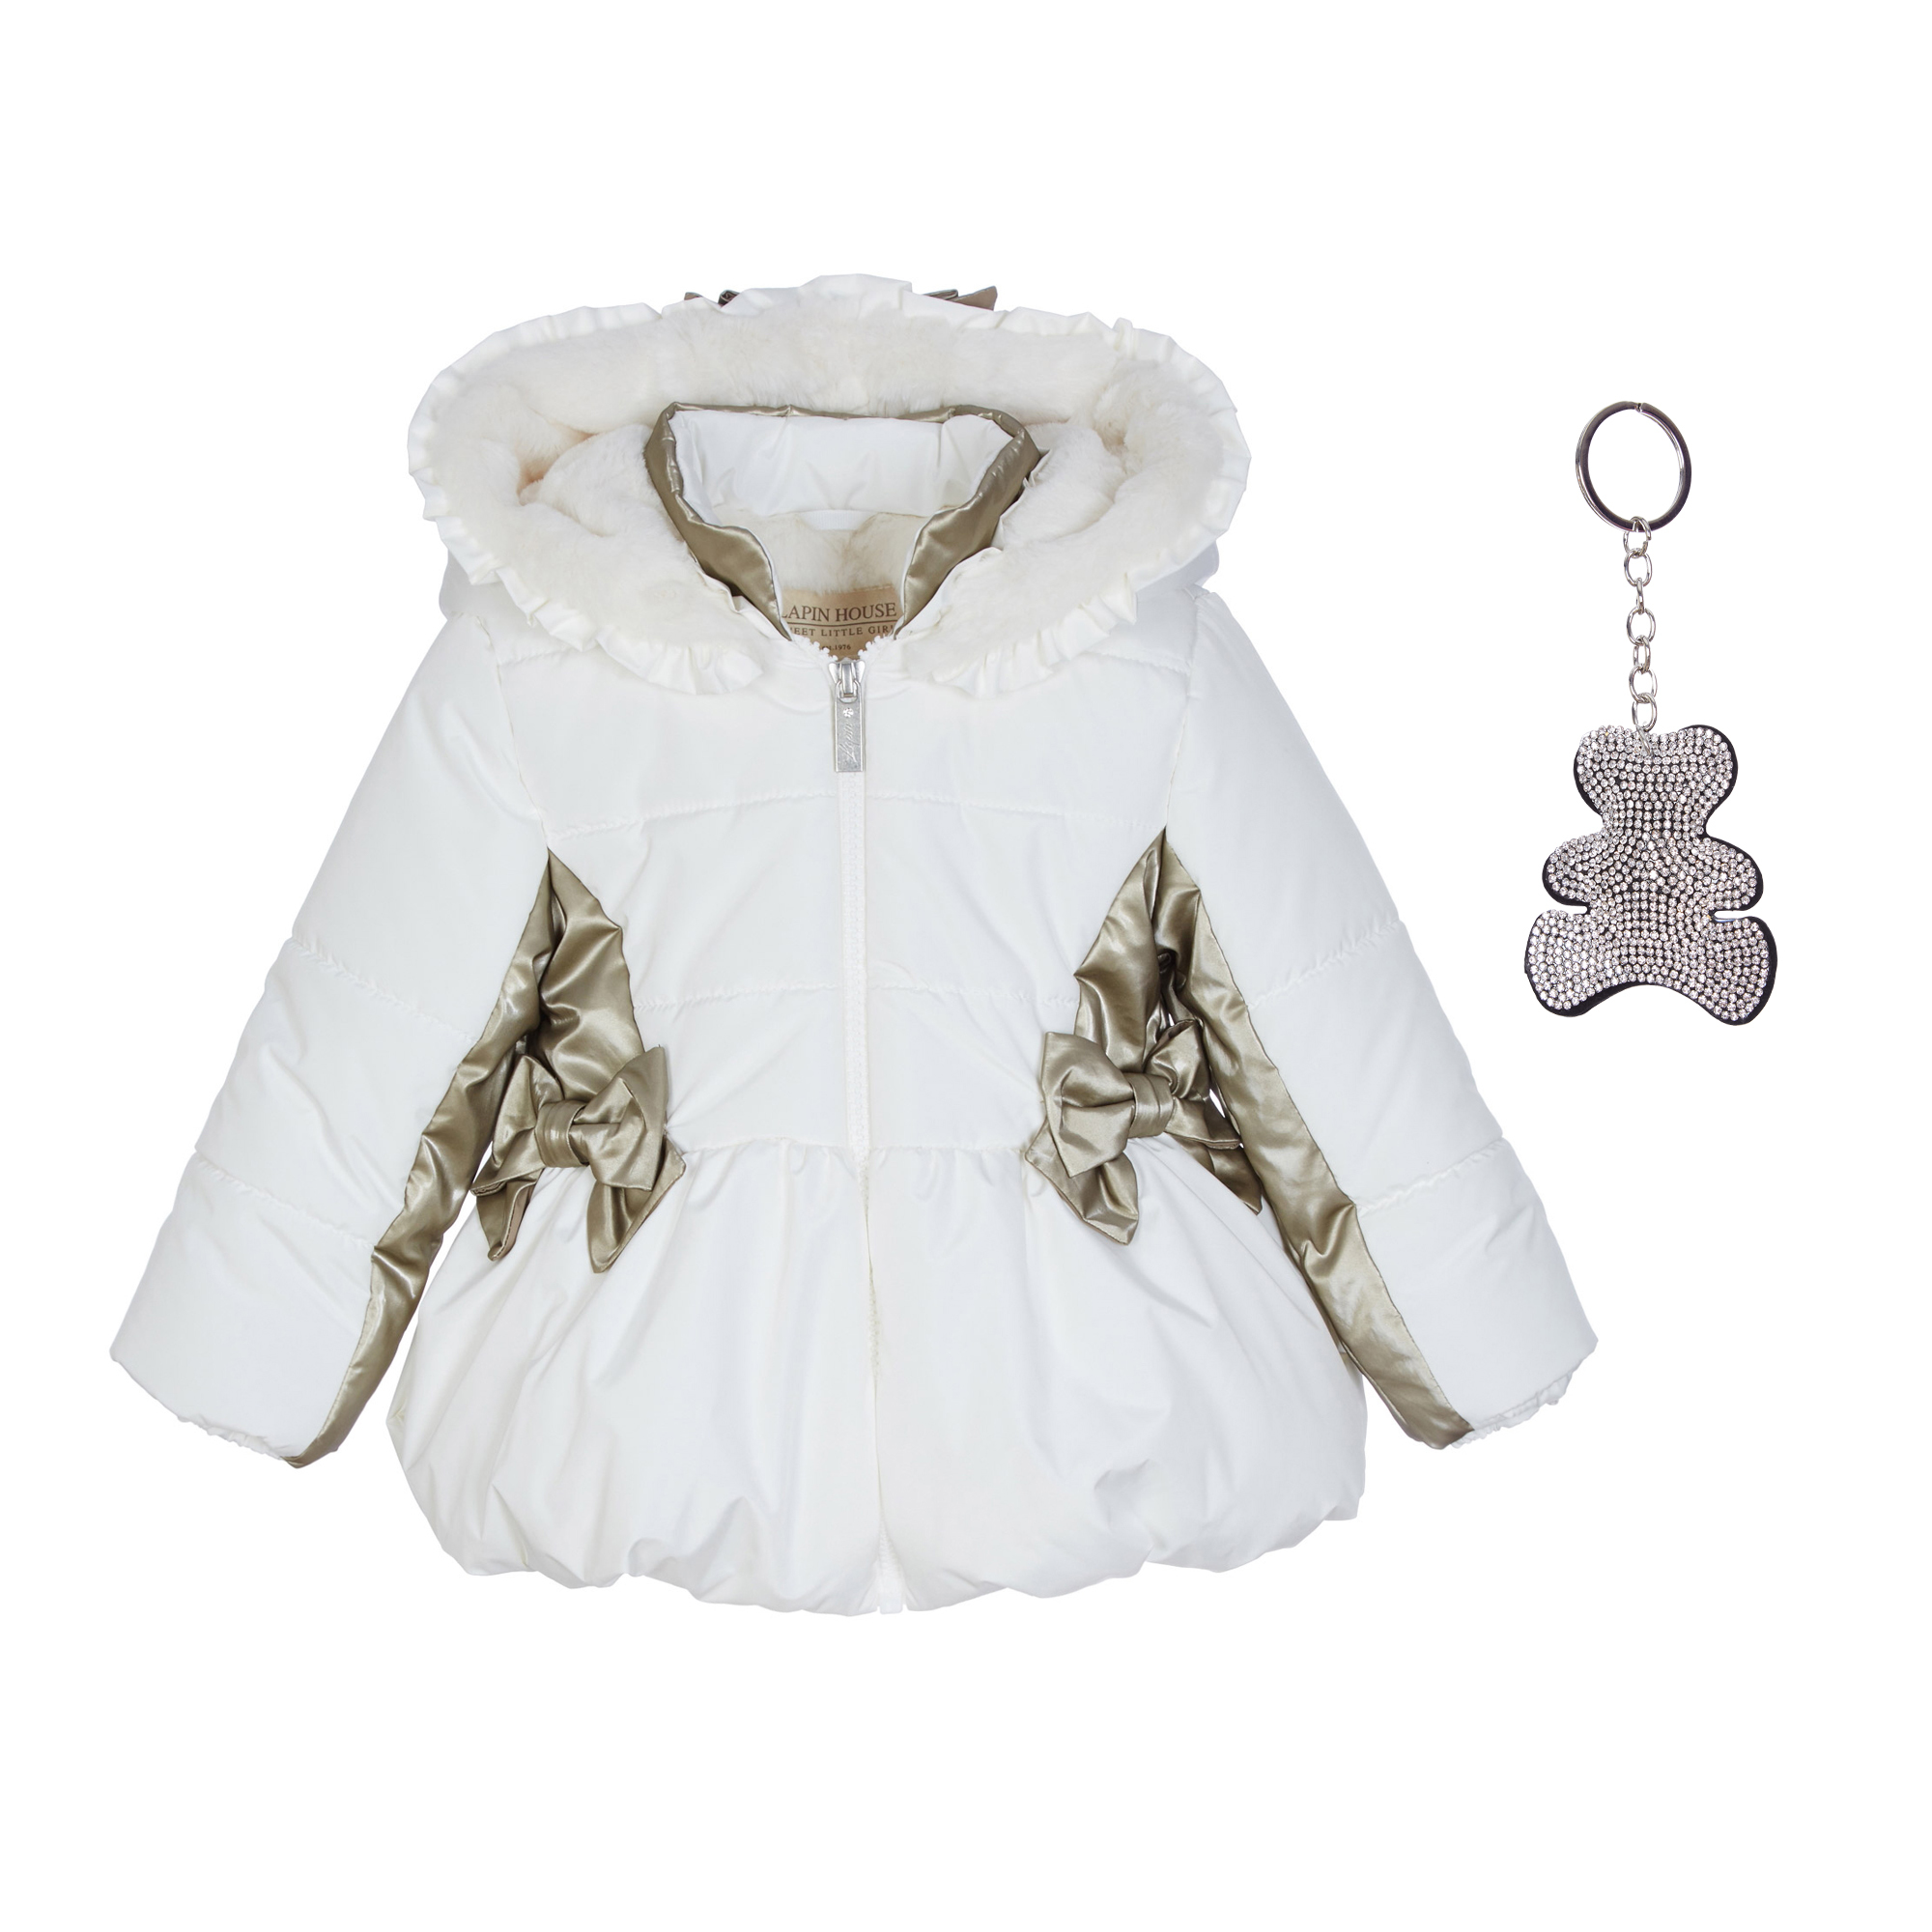 90475c8c480e Παιδικά Ρούχα - Lapin House